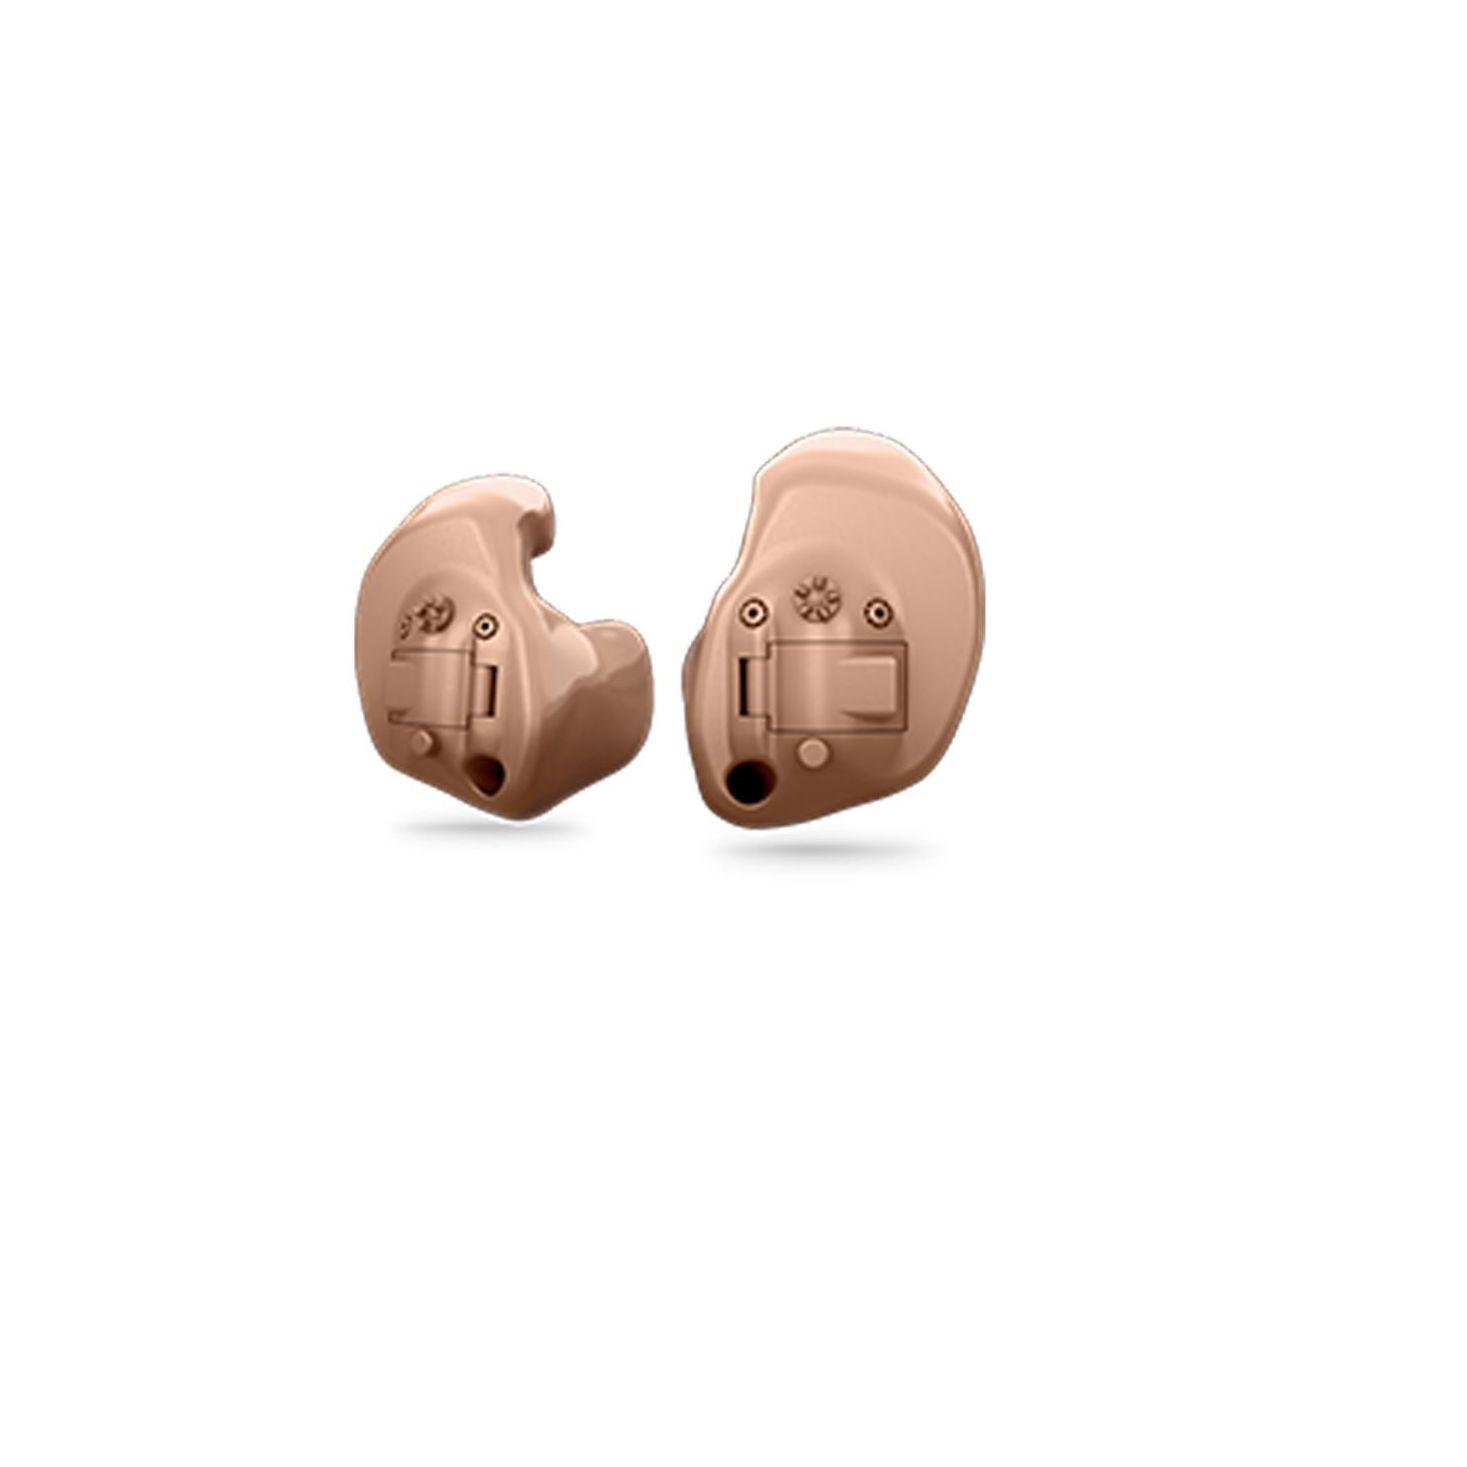 Audífonos ITE (intrauriculares): Productos    de Audítus